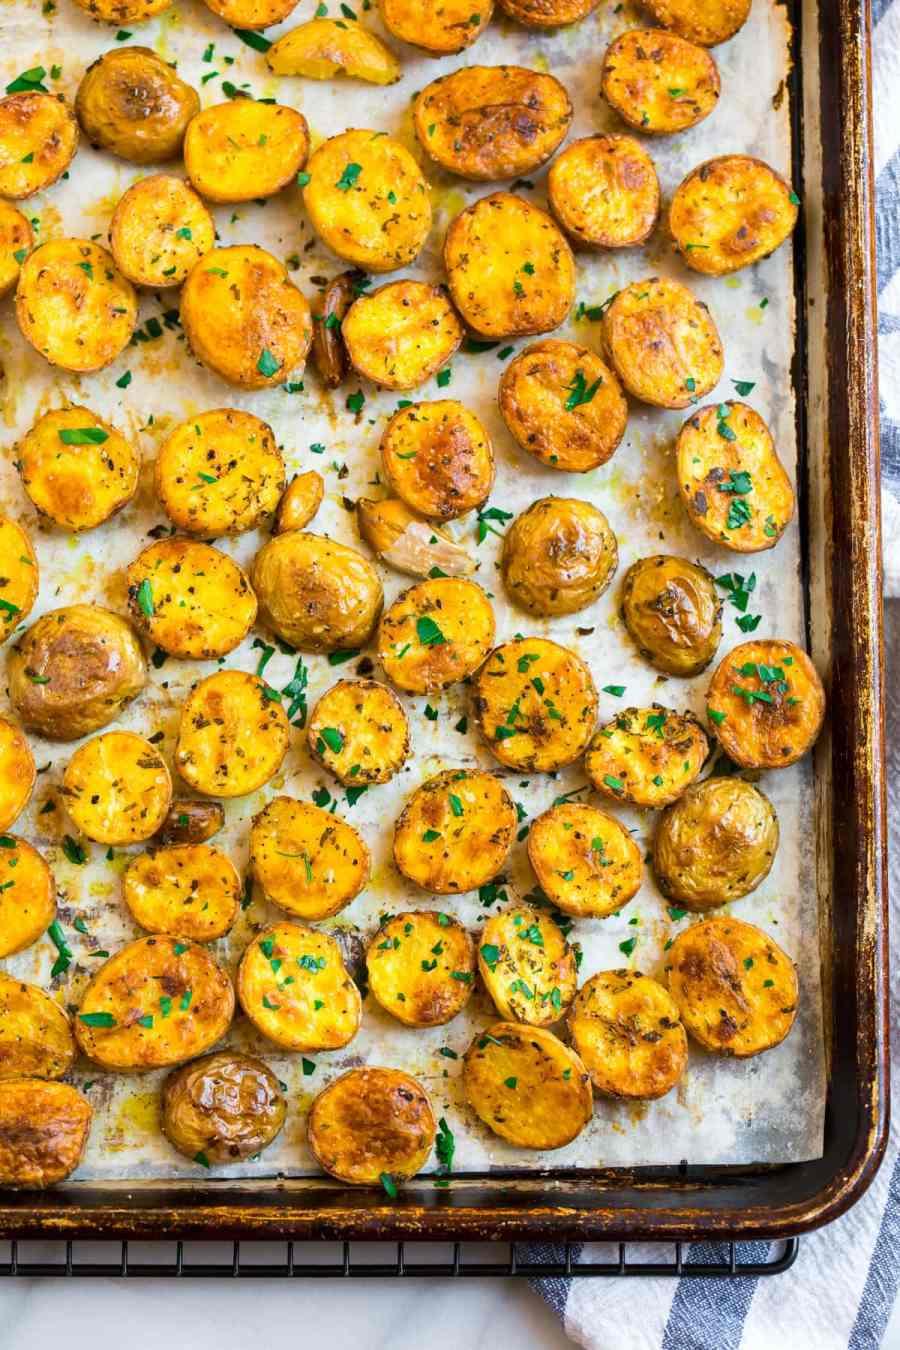 Sliced potatoes on a sheet pan